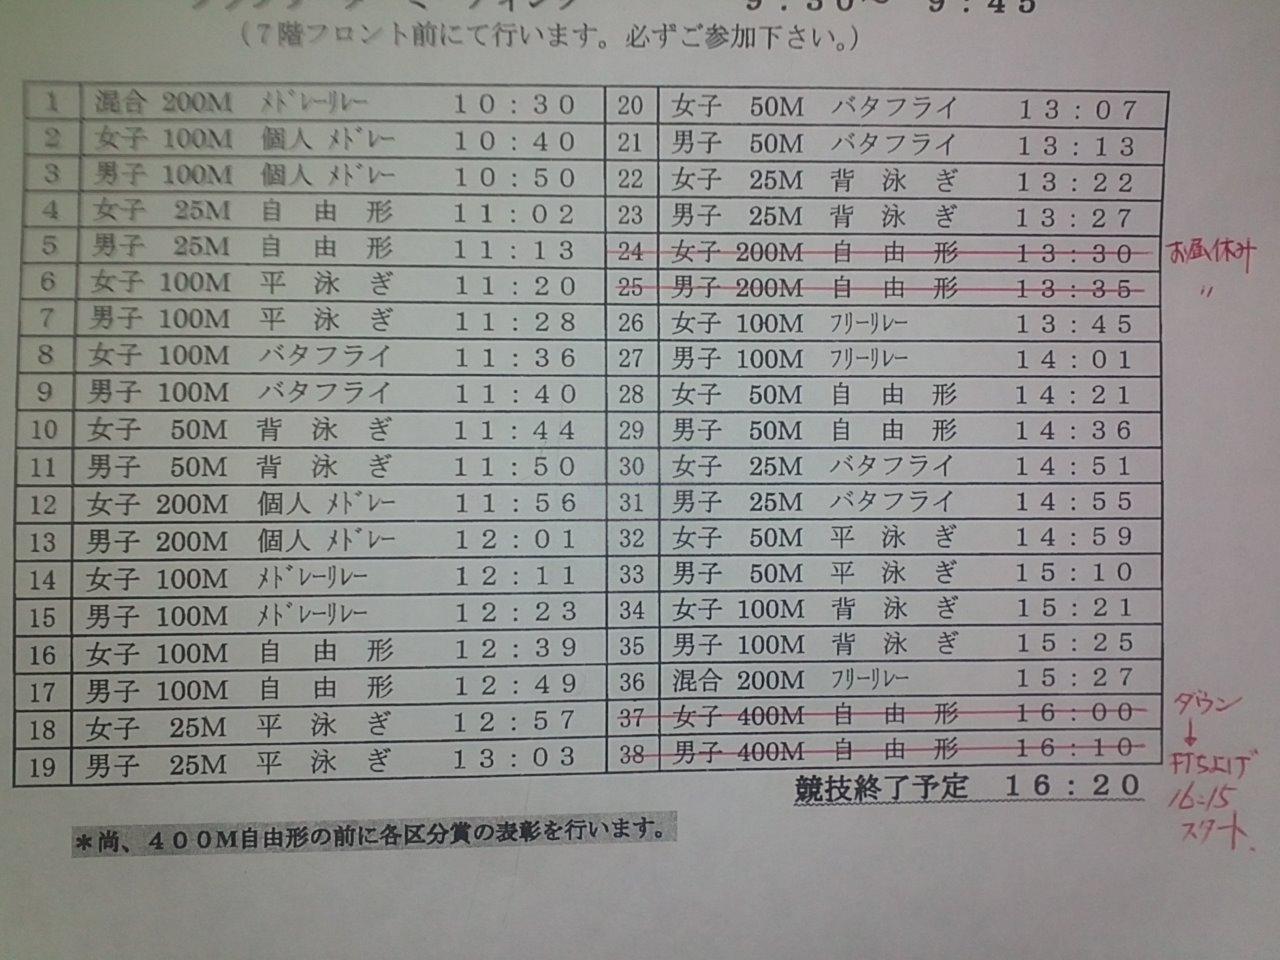 moblog_abf76c37.jpg